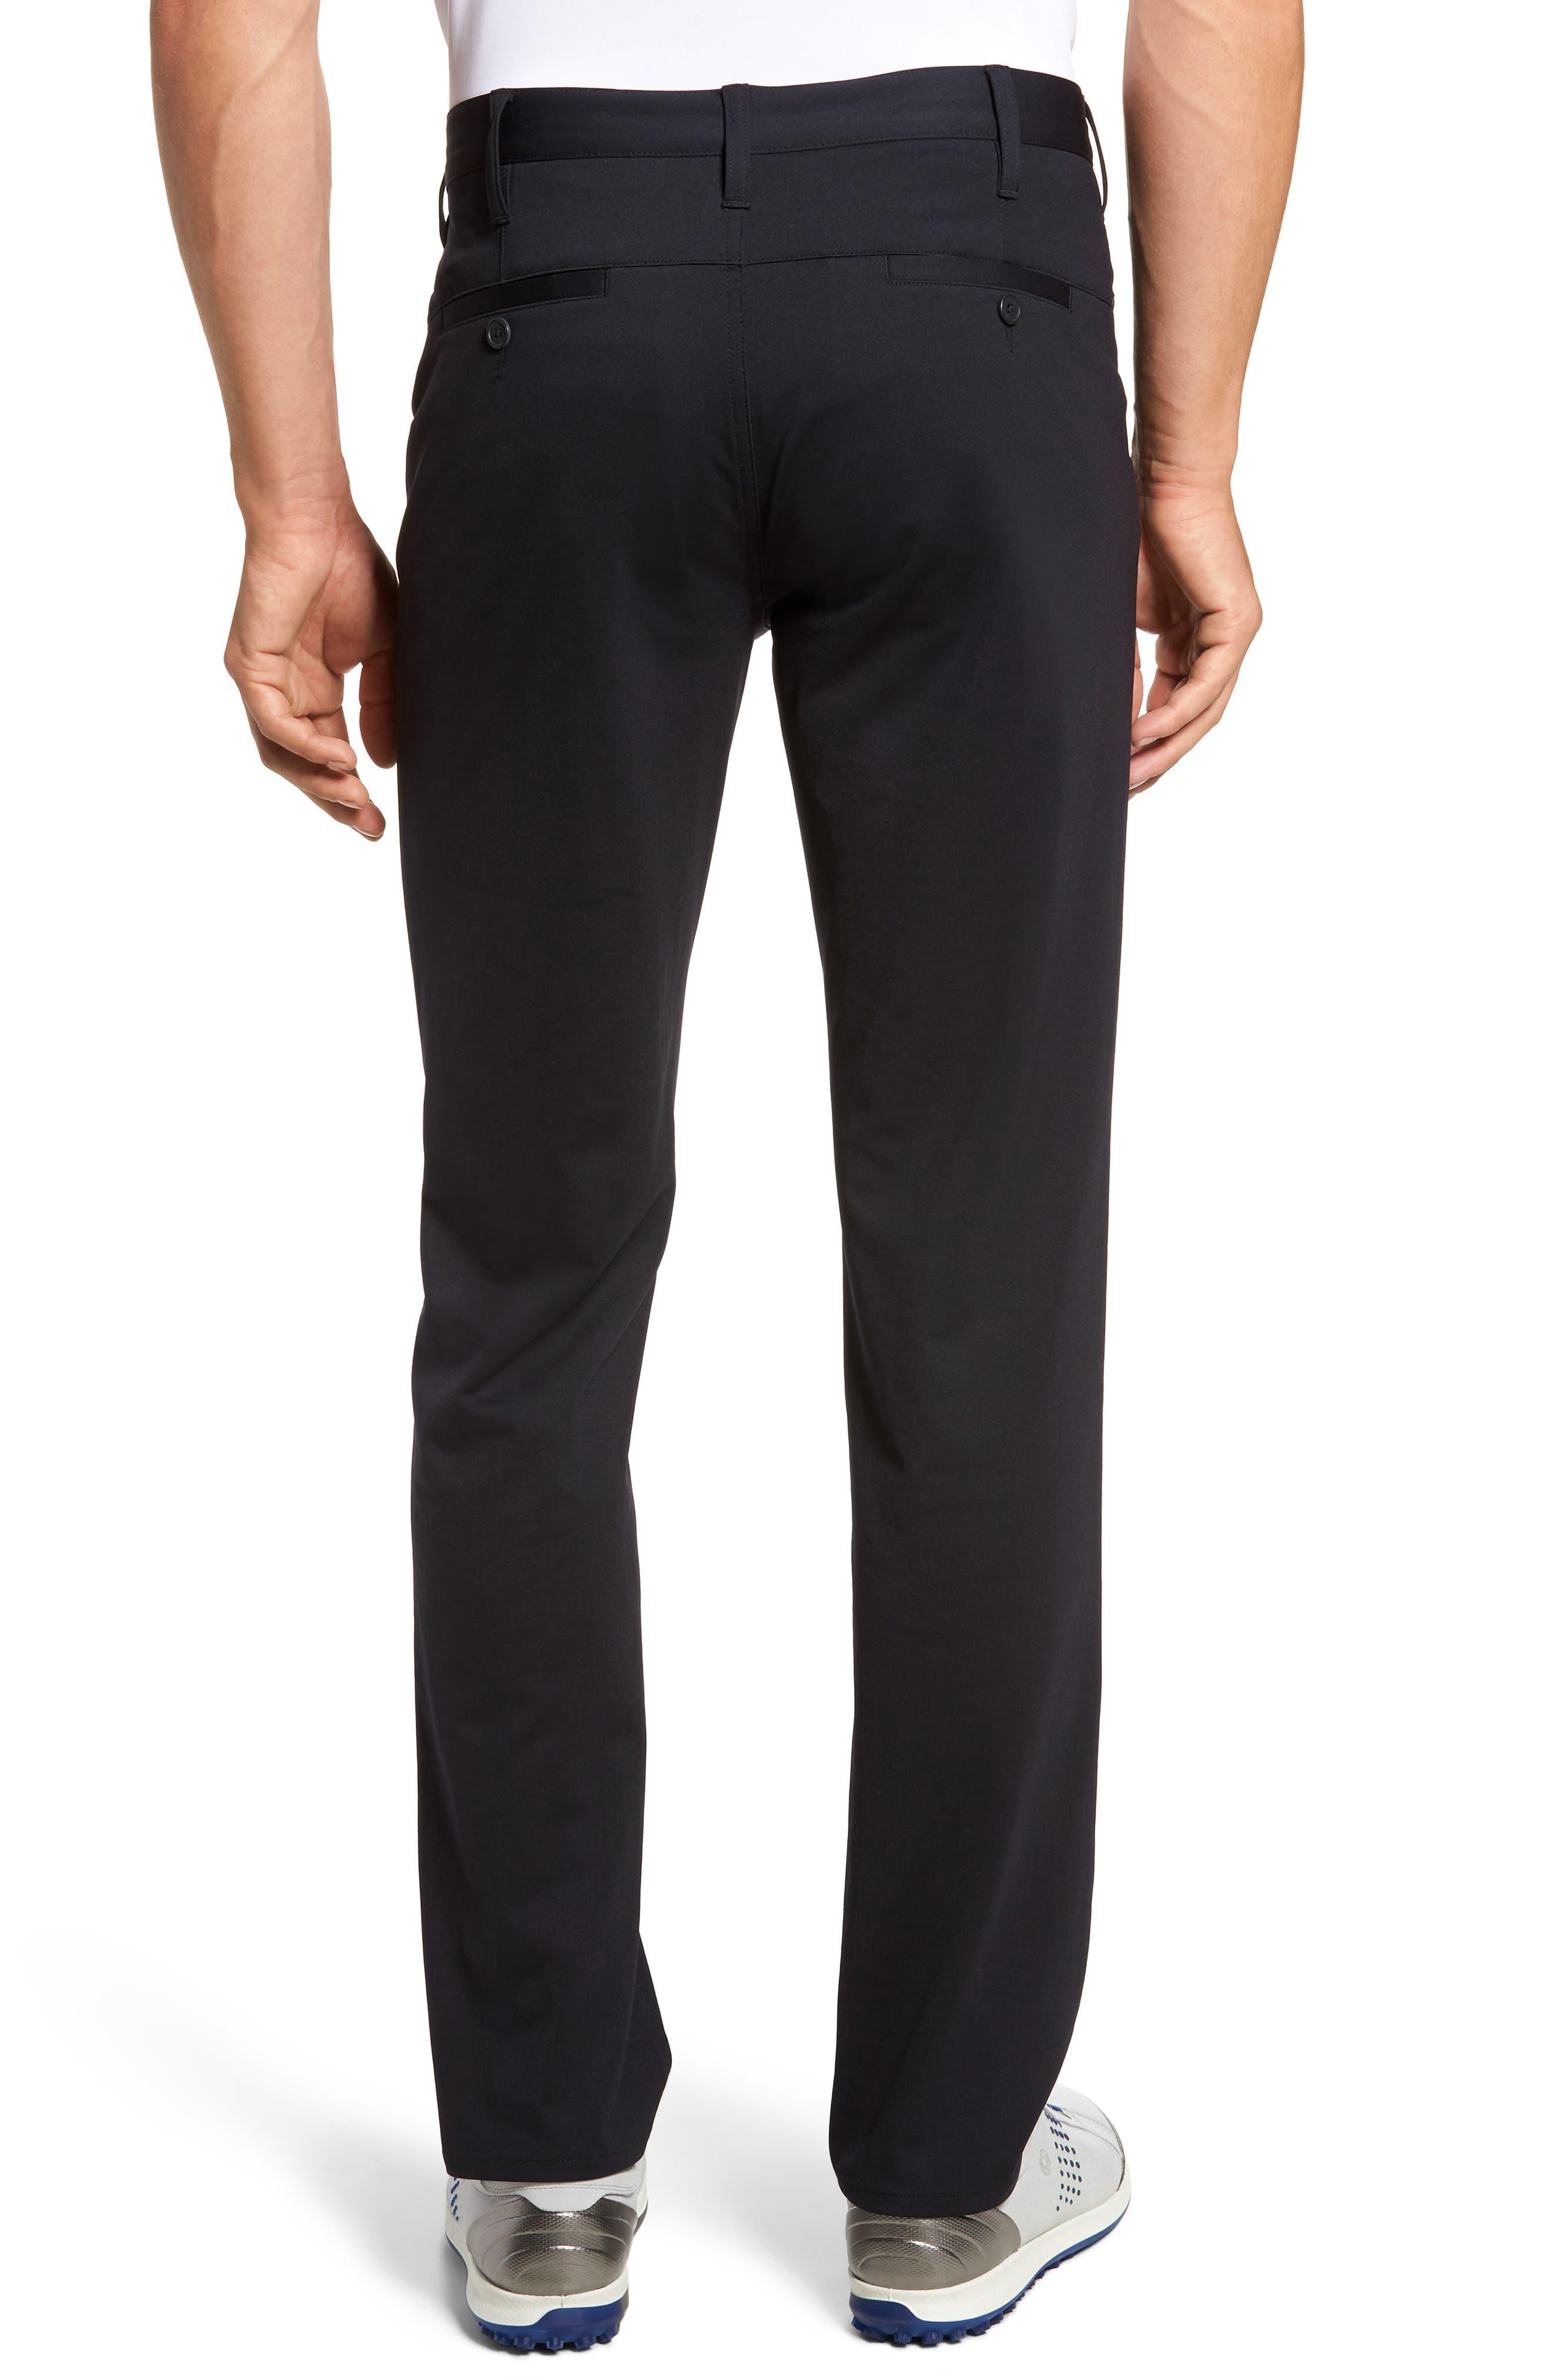 R18 Tech Pants,                             Alternate thumbnail 2, color,                             BLACK